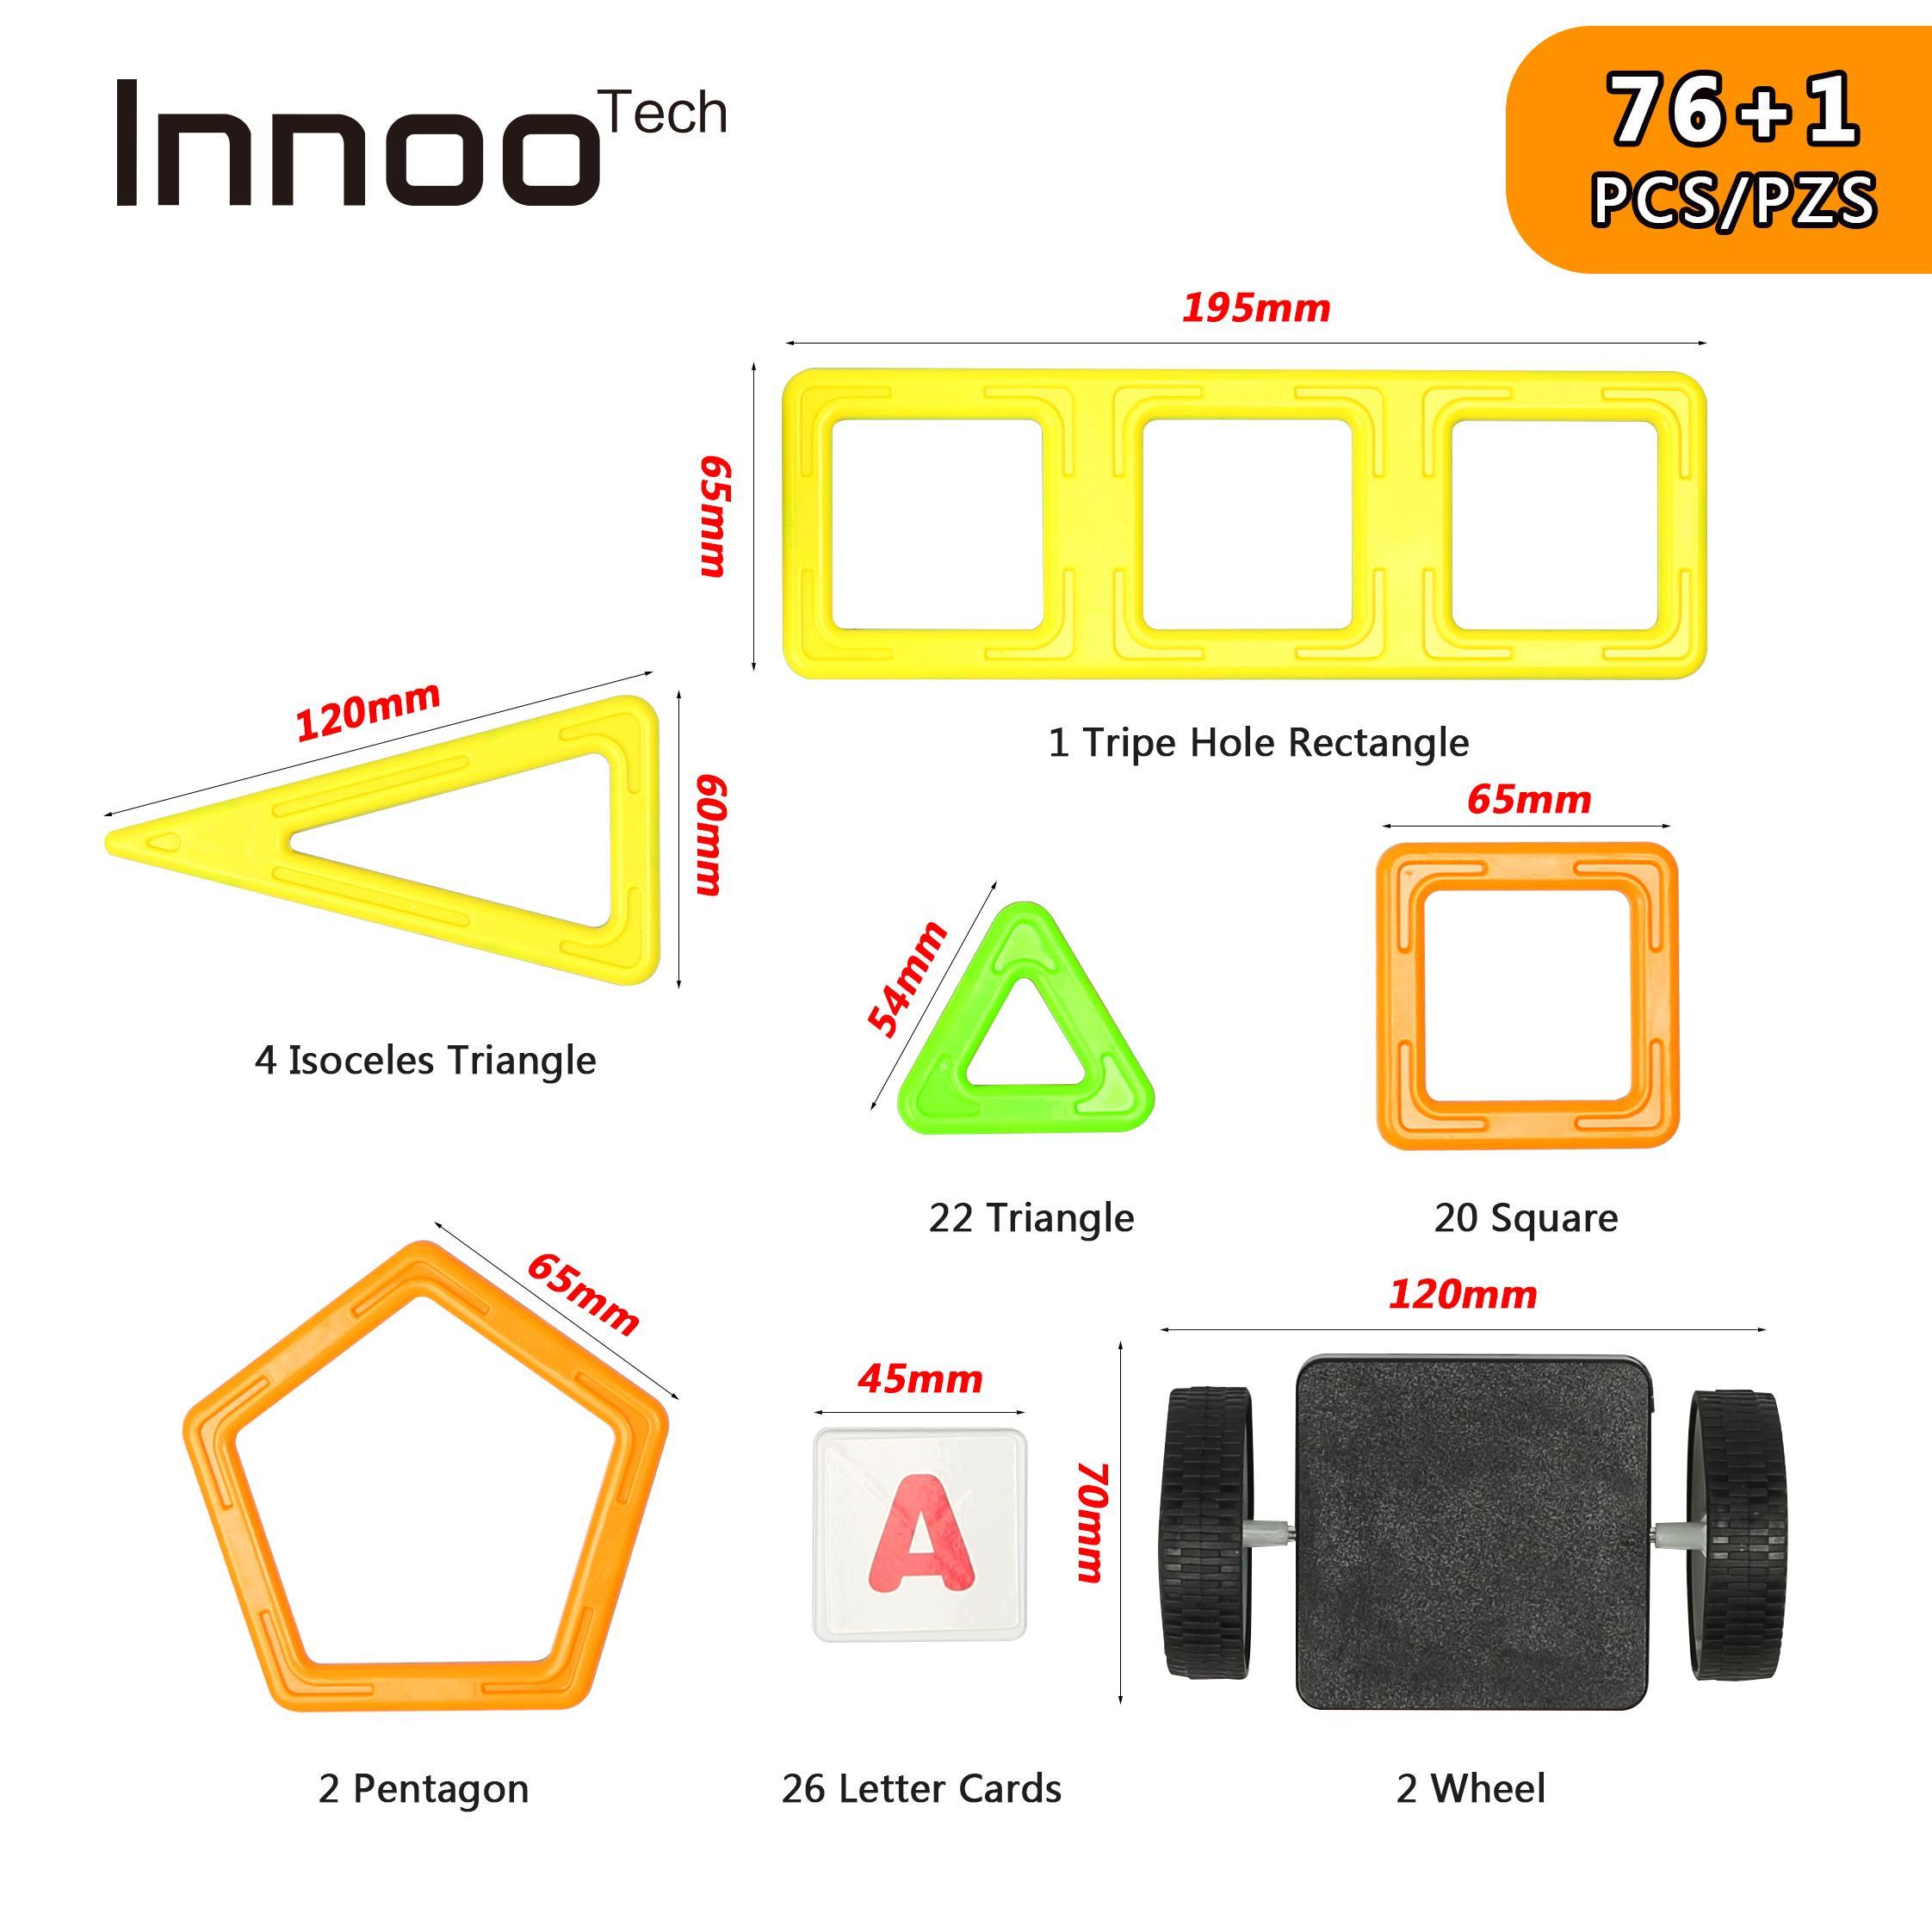 Innoo Tech Magnetic Building Blocks